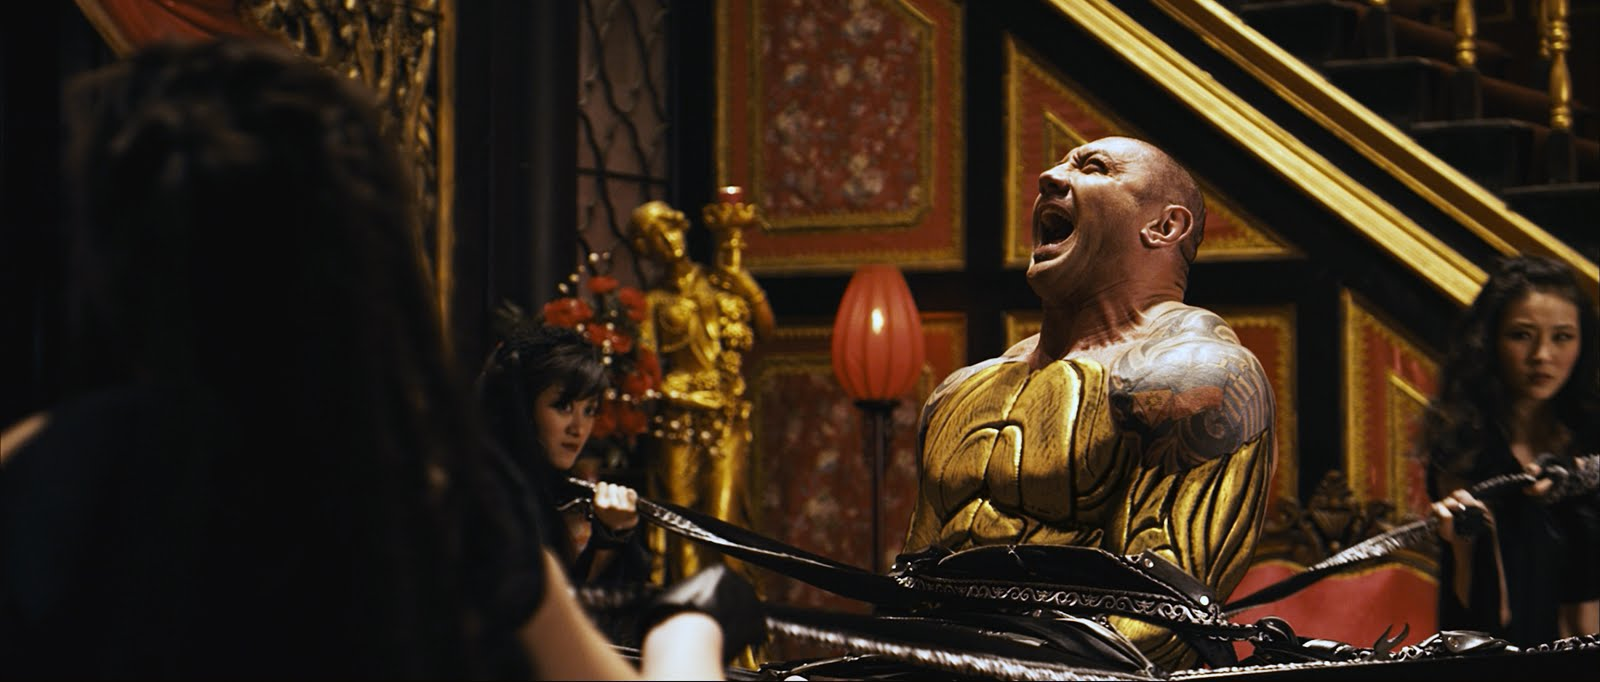 man with iron fist sex scene